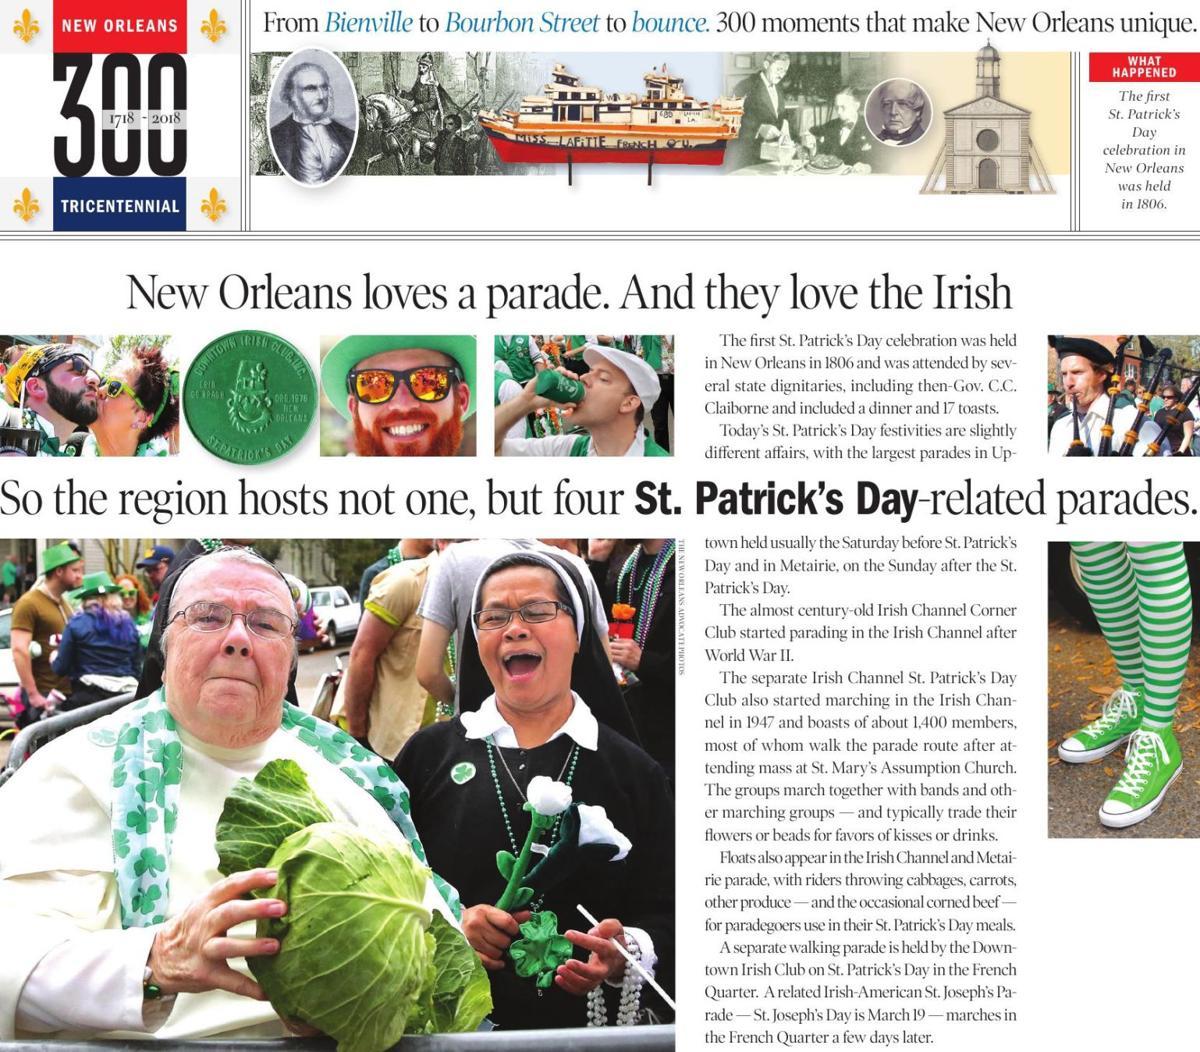 300 St. Patrick's Day